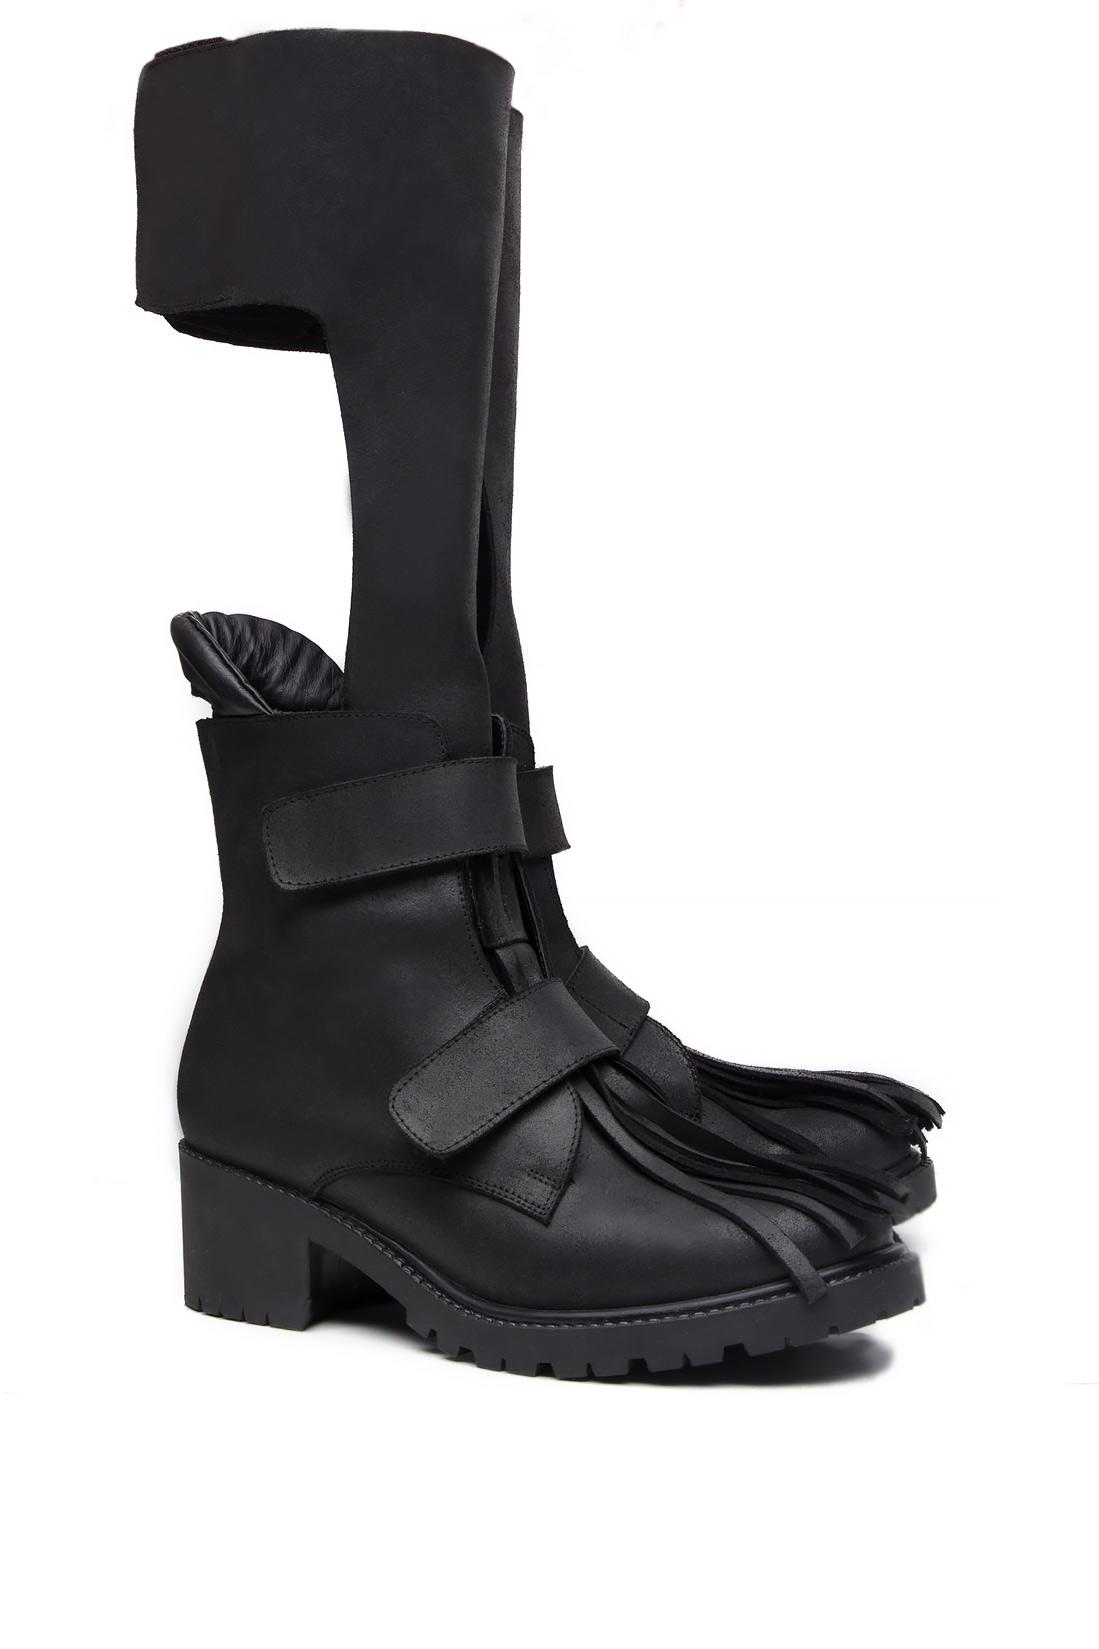 Fringed cutout leather ankle boots Mihaela Glavan  image 1